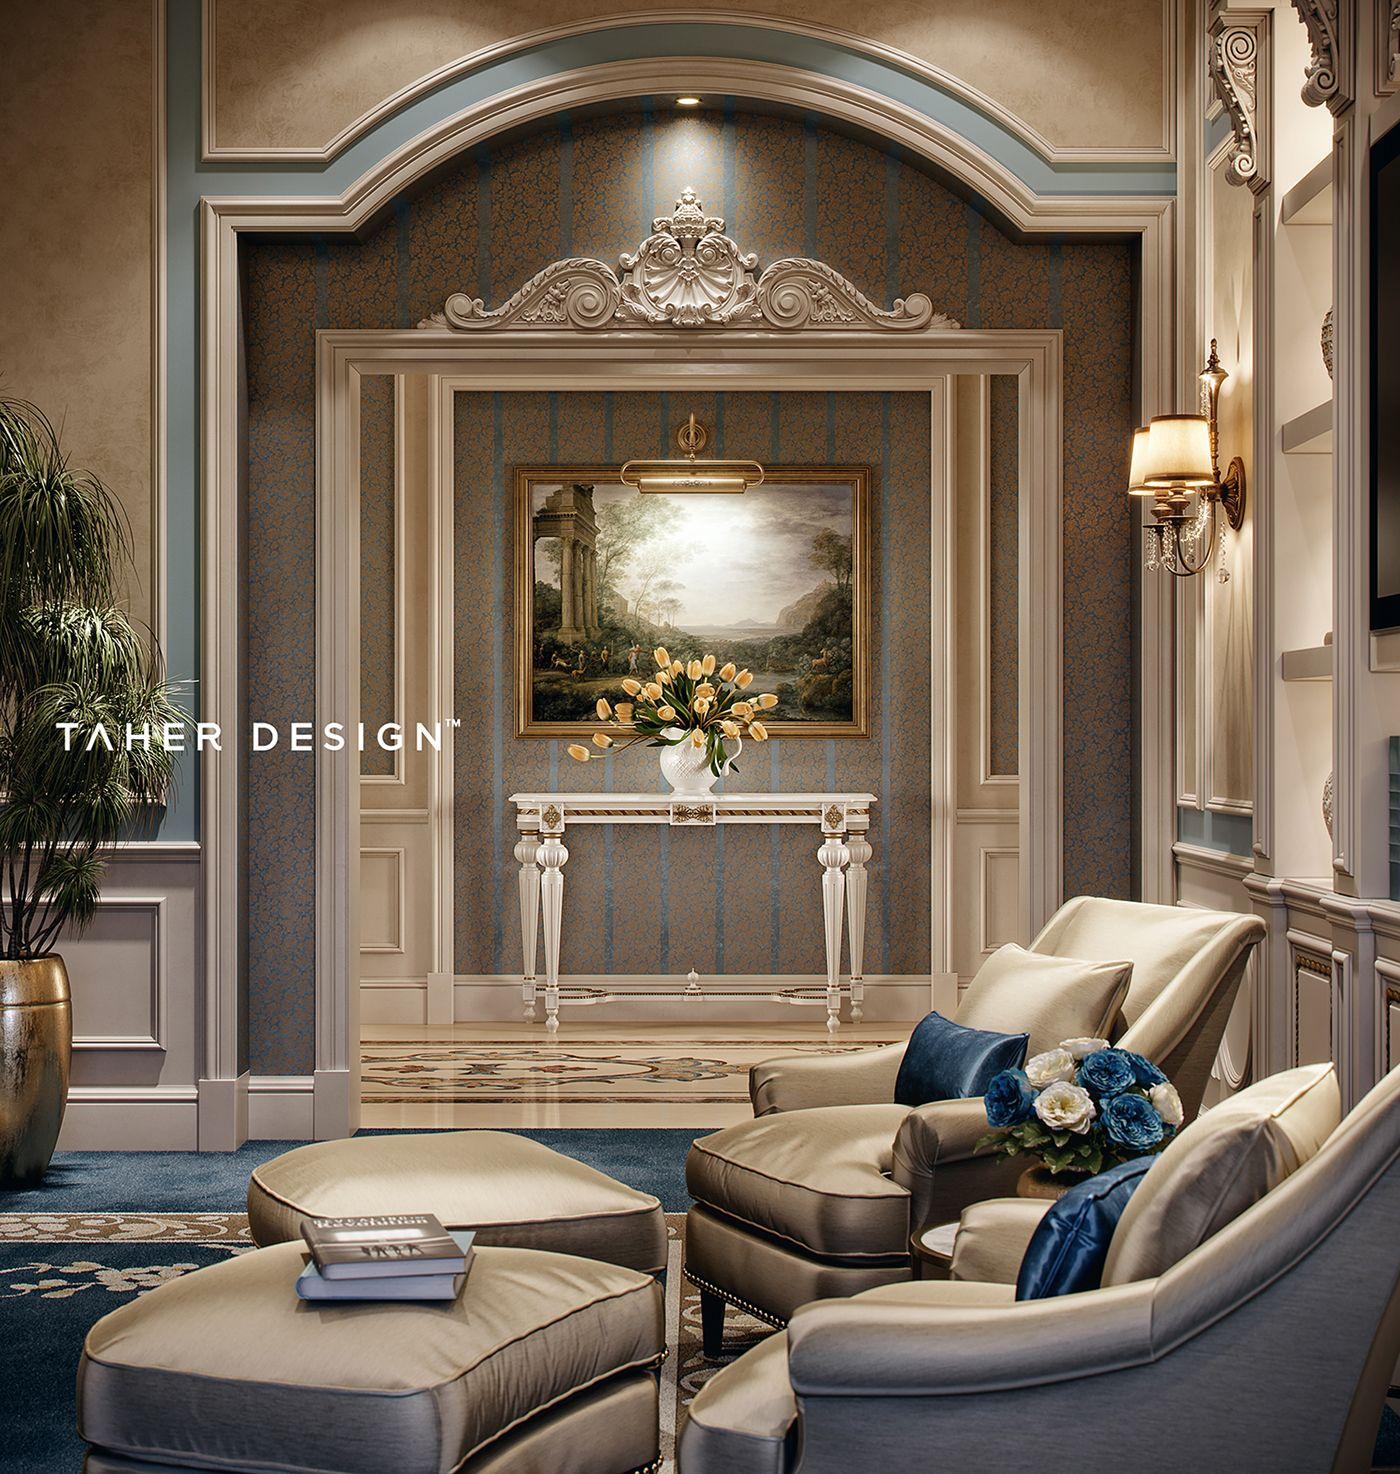 Luxury master bedroom dubai on behance in 2019 - Interior design courses in dubai ...